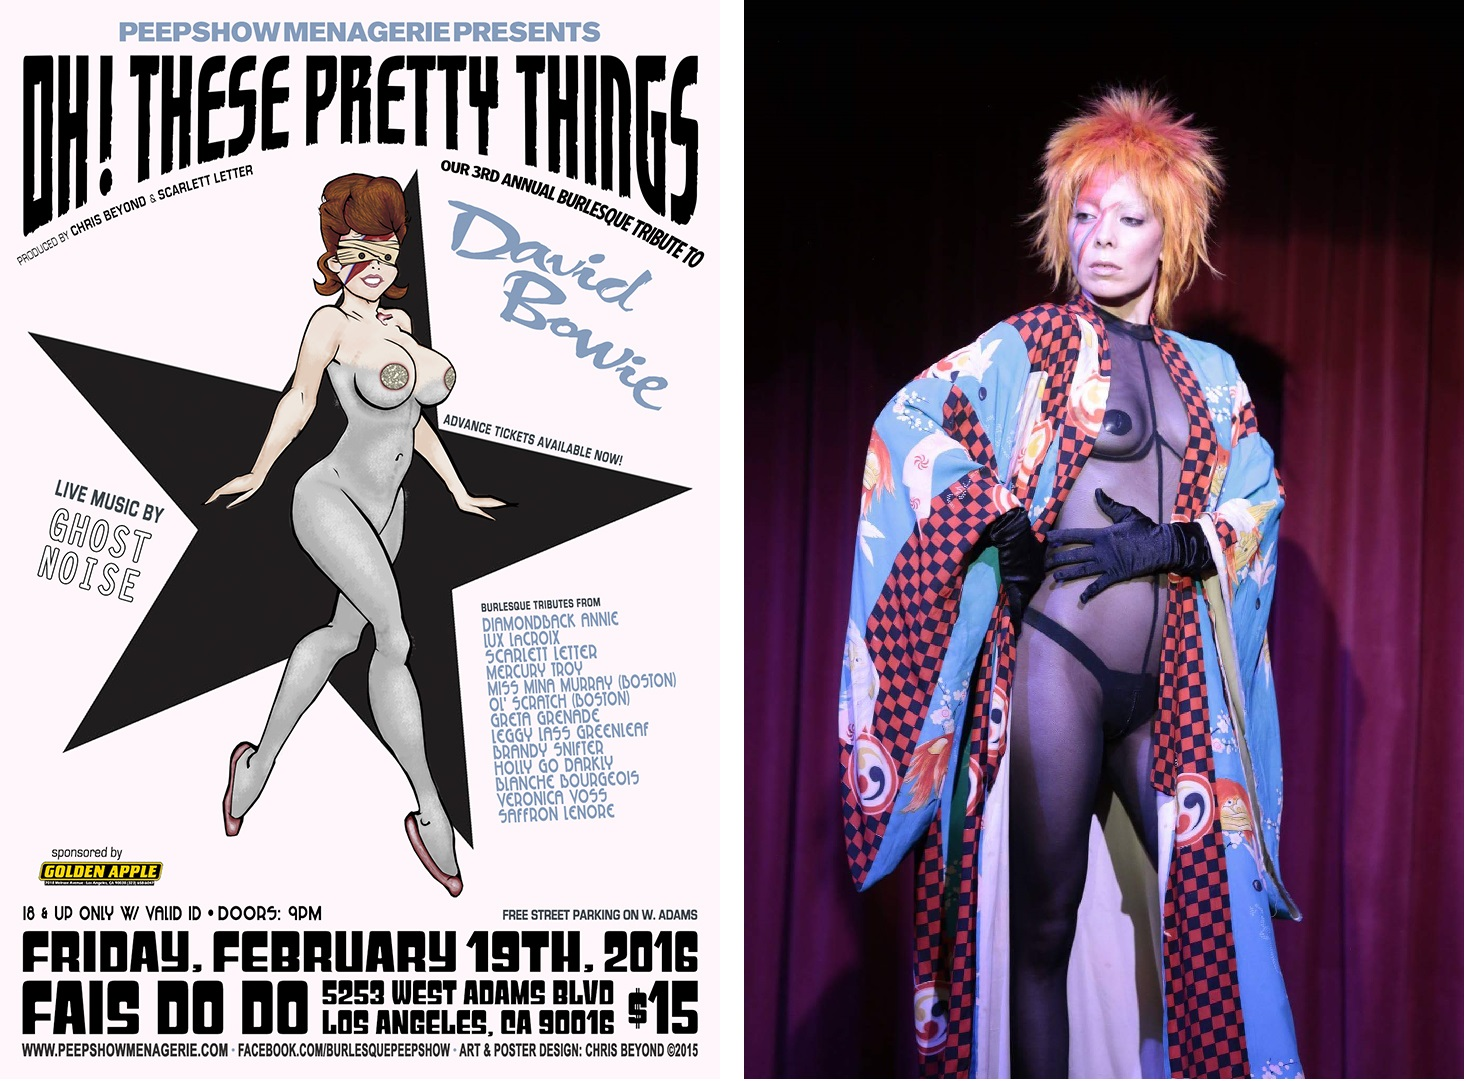 Peepshow Bowie flyer 2016.jpg